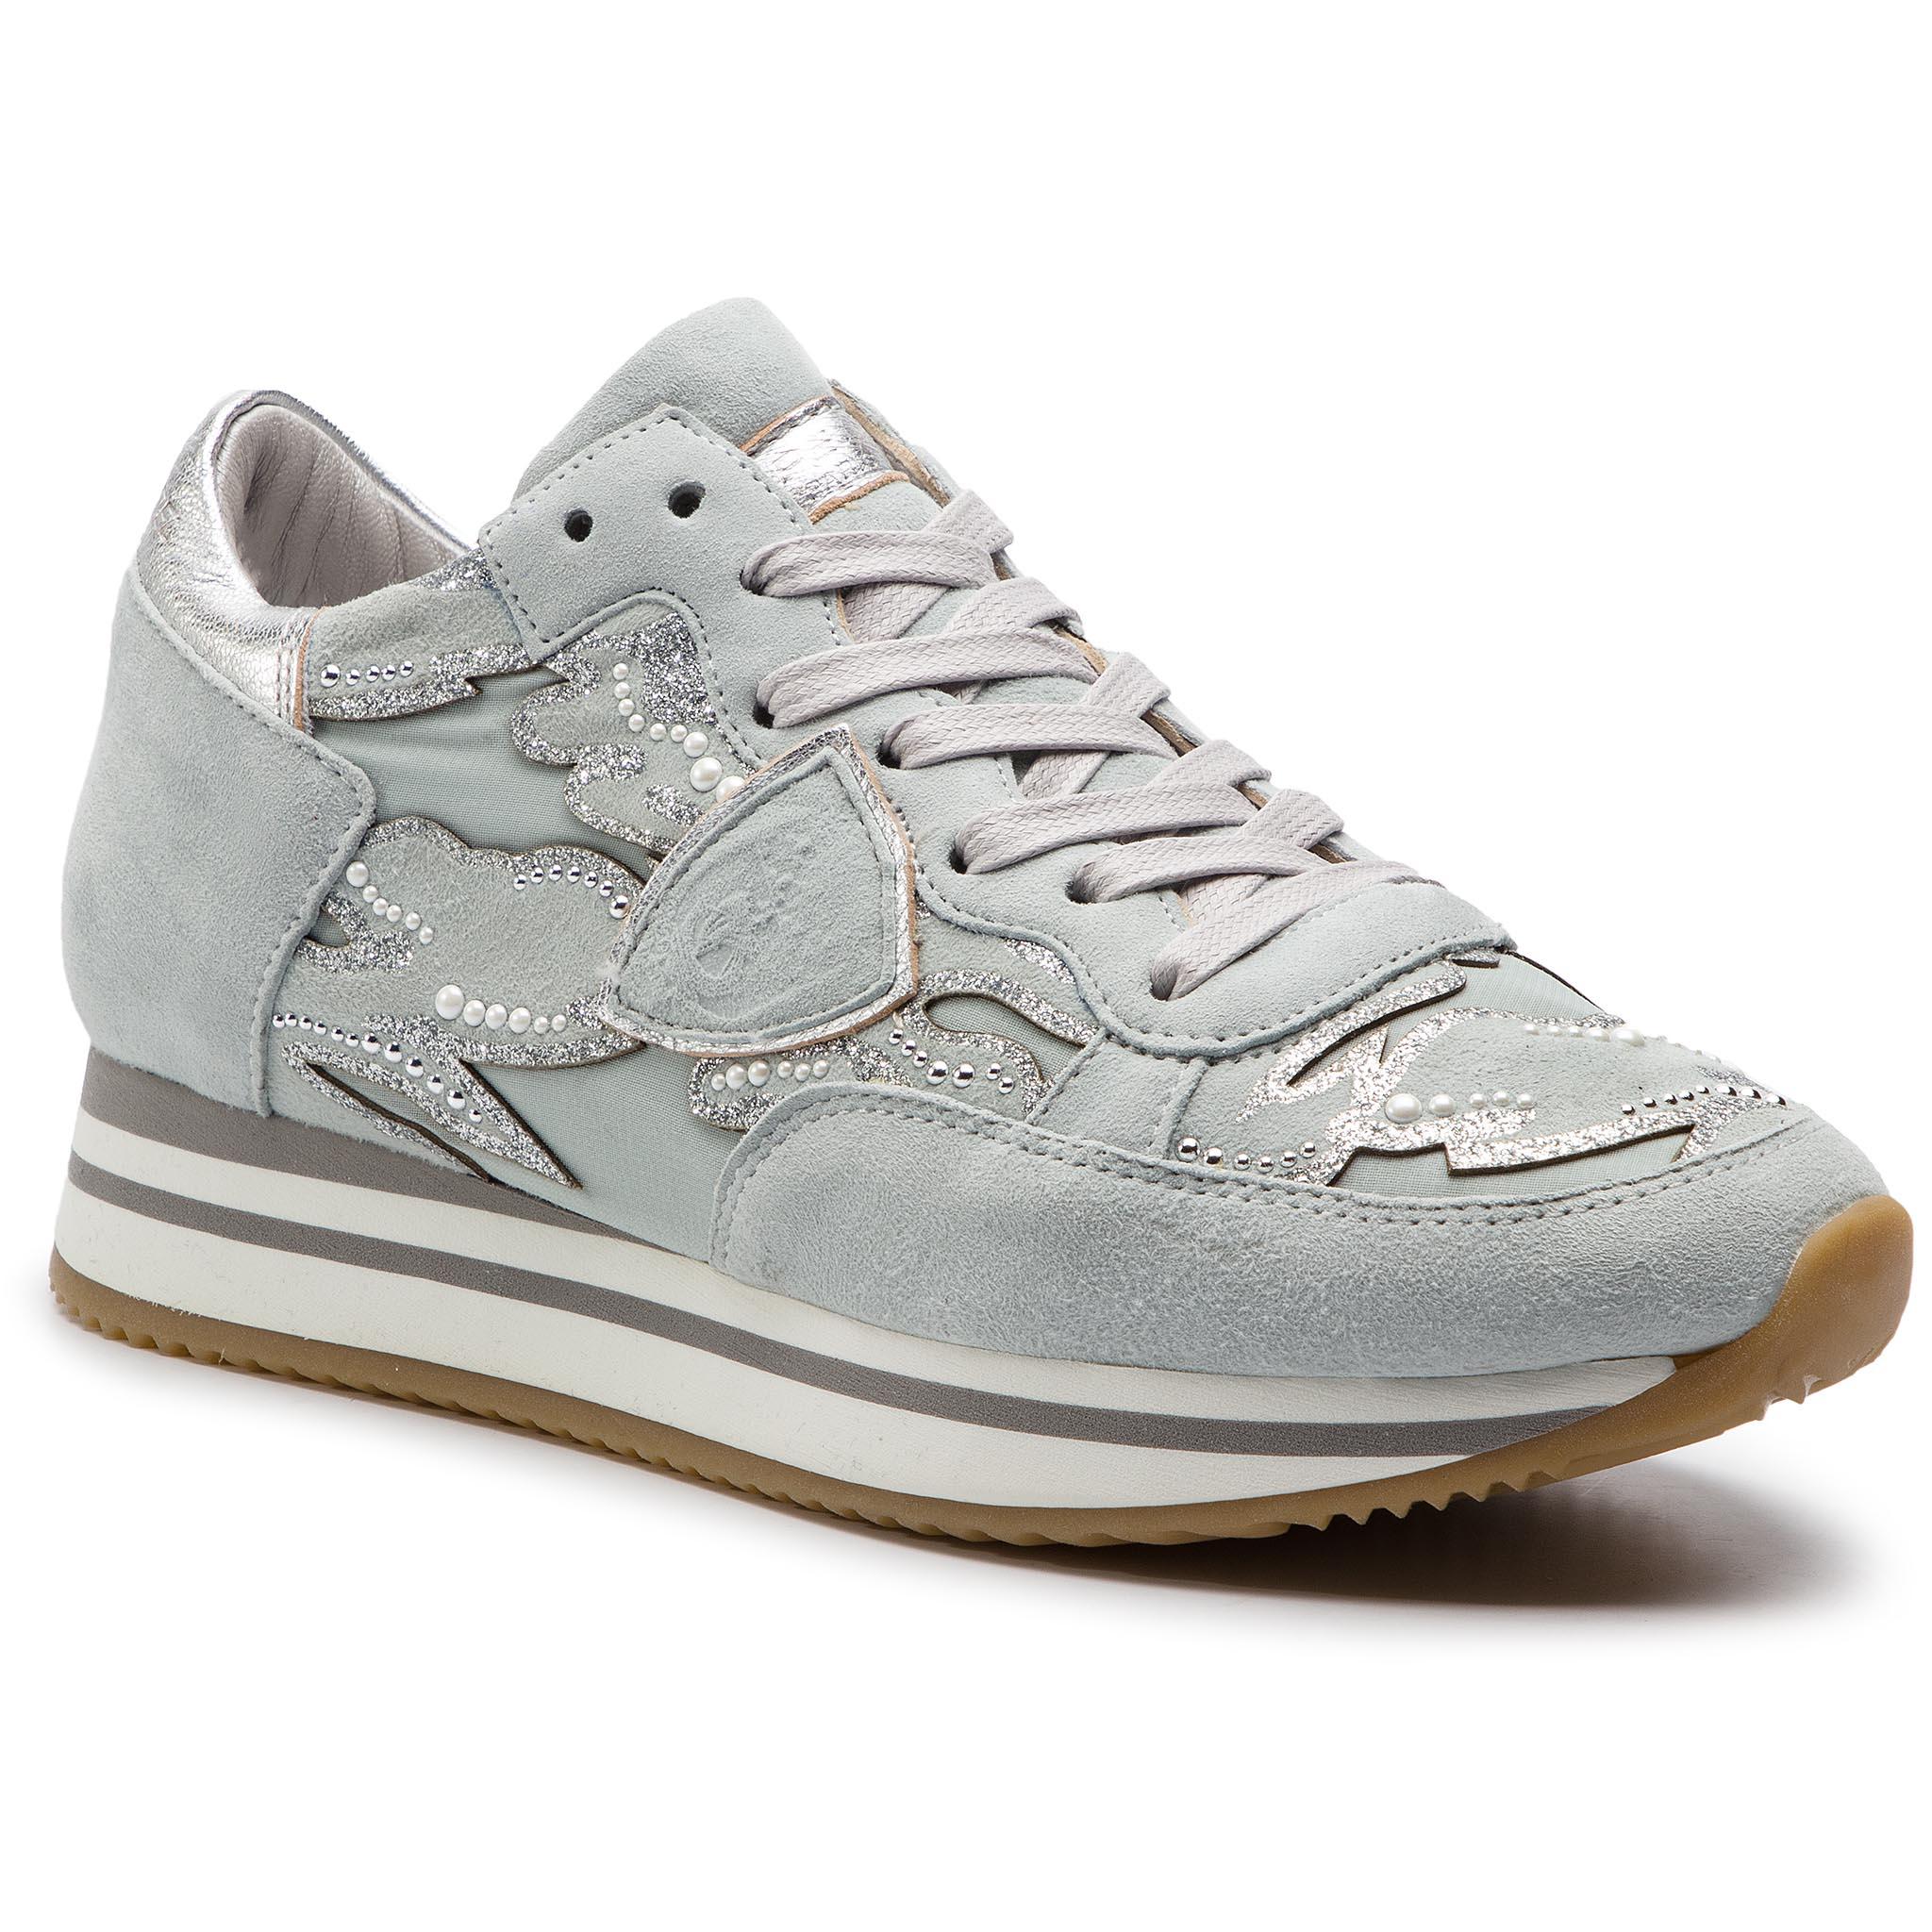 Sneakers PHILIPPE MODEL Tropez TRLD DC01 Blanc Mix